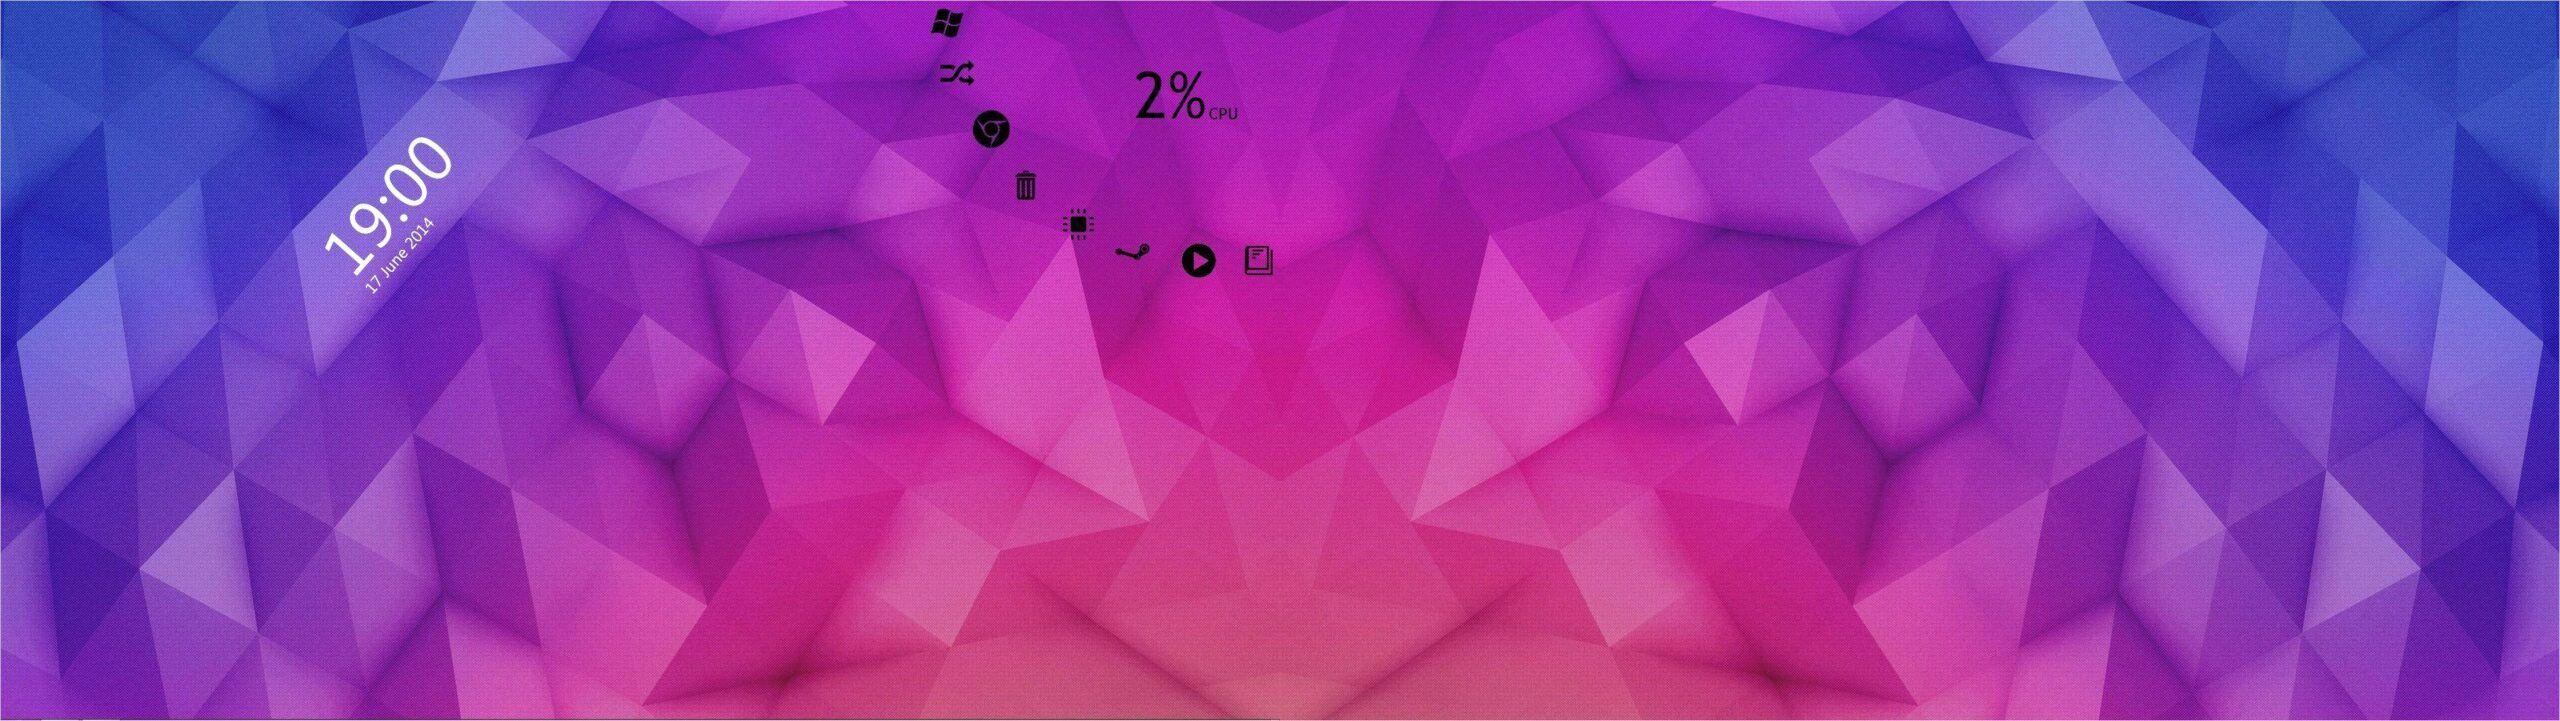 4k Dual Monitor Wallpaper Polygons In 2020 Dual Monitor Wallpaper Wallpaper Polygon